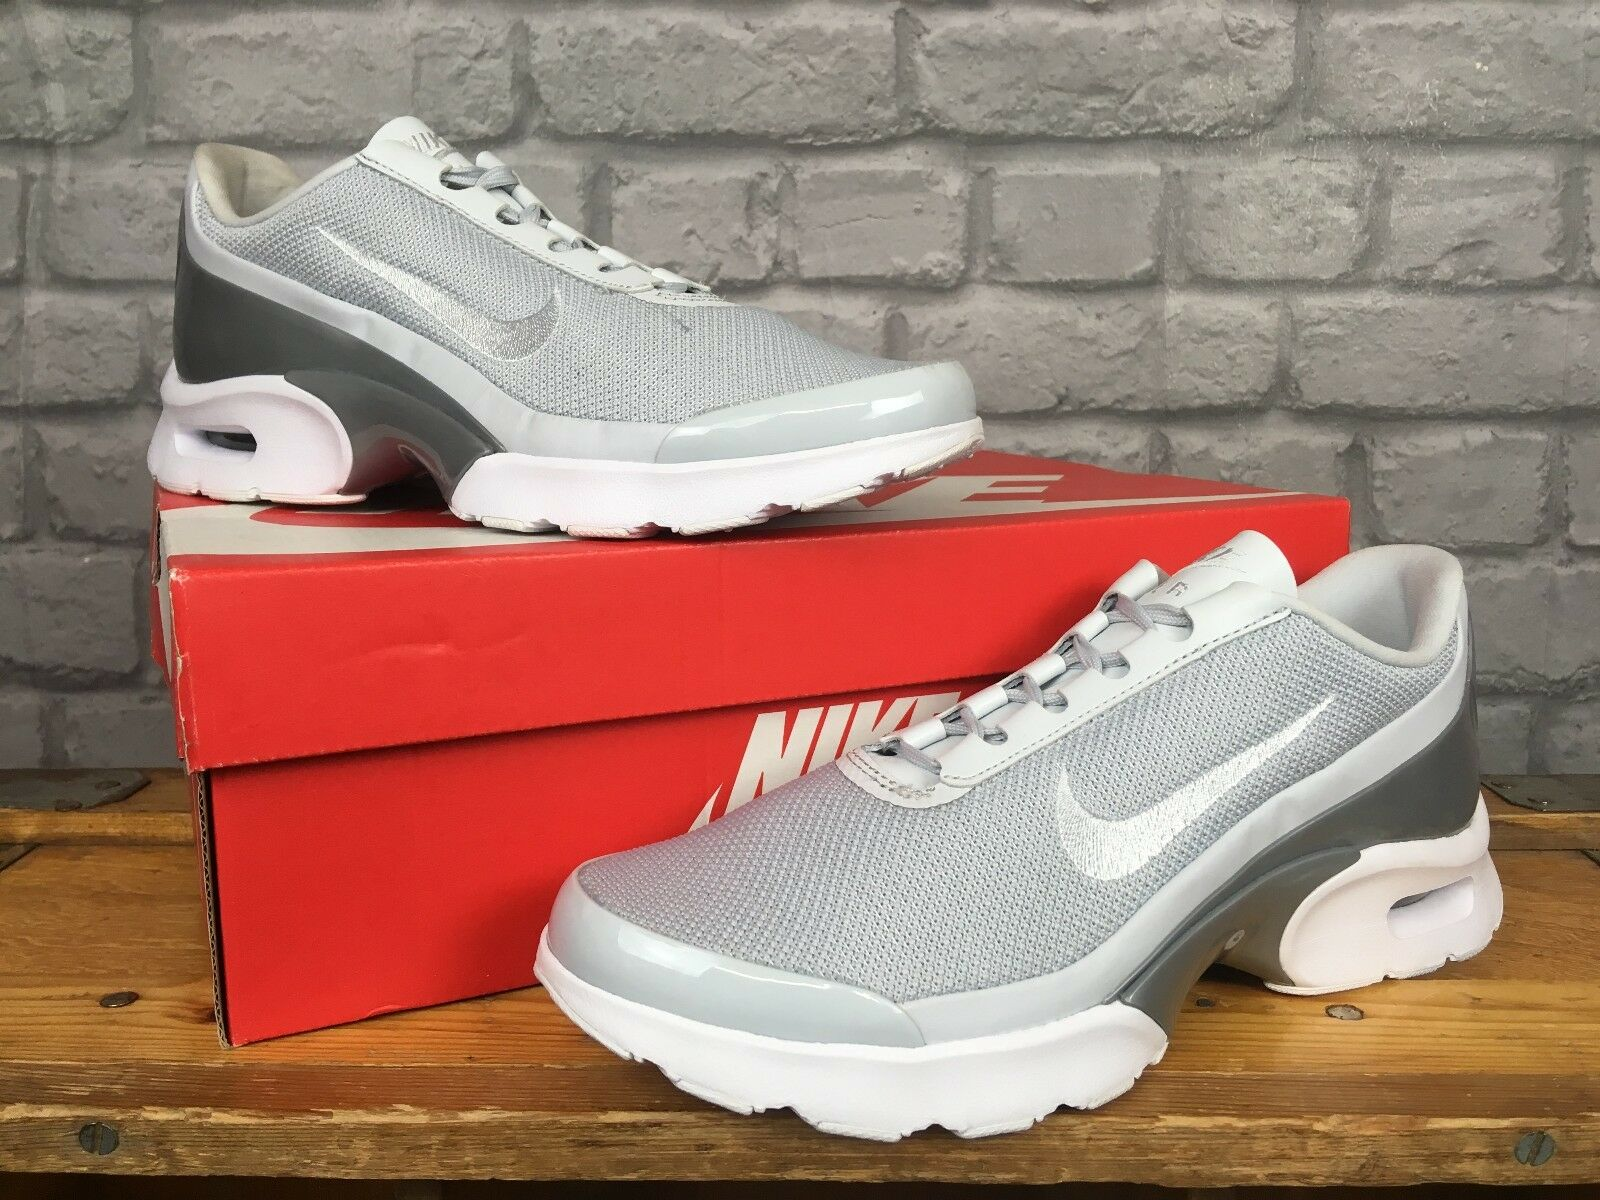 Nike Donna EU 40 Grigio Bianco JEWELL PRM   Da Ginnastica Rrp